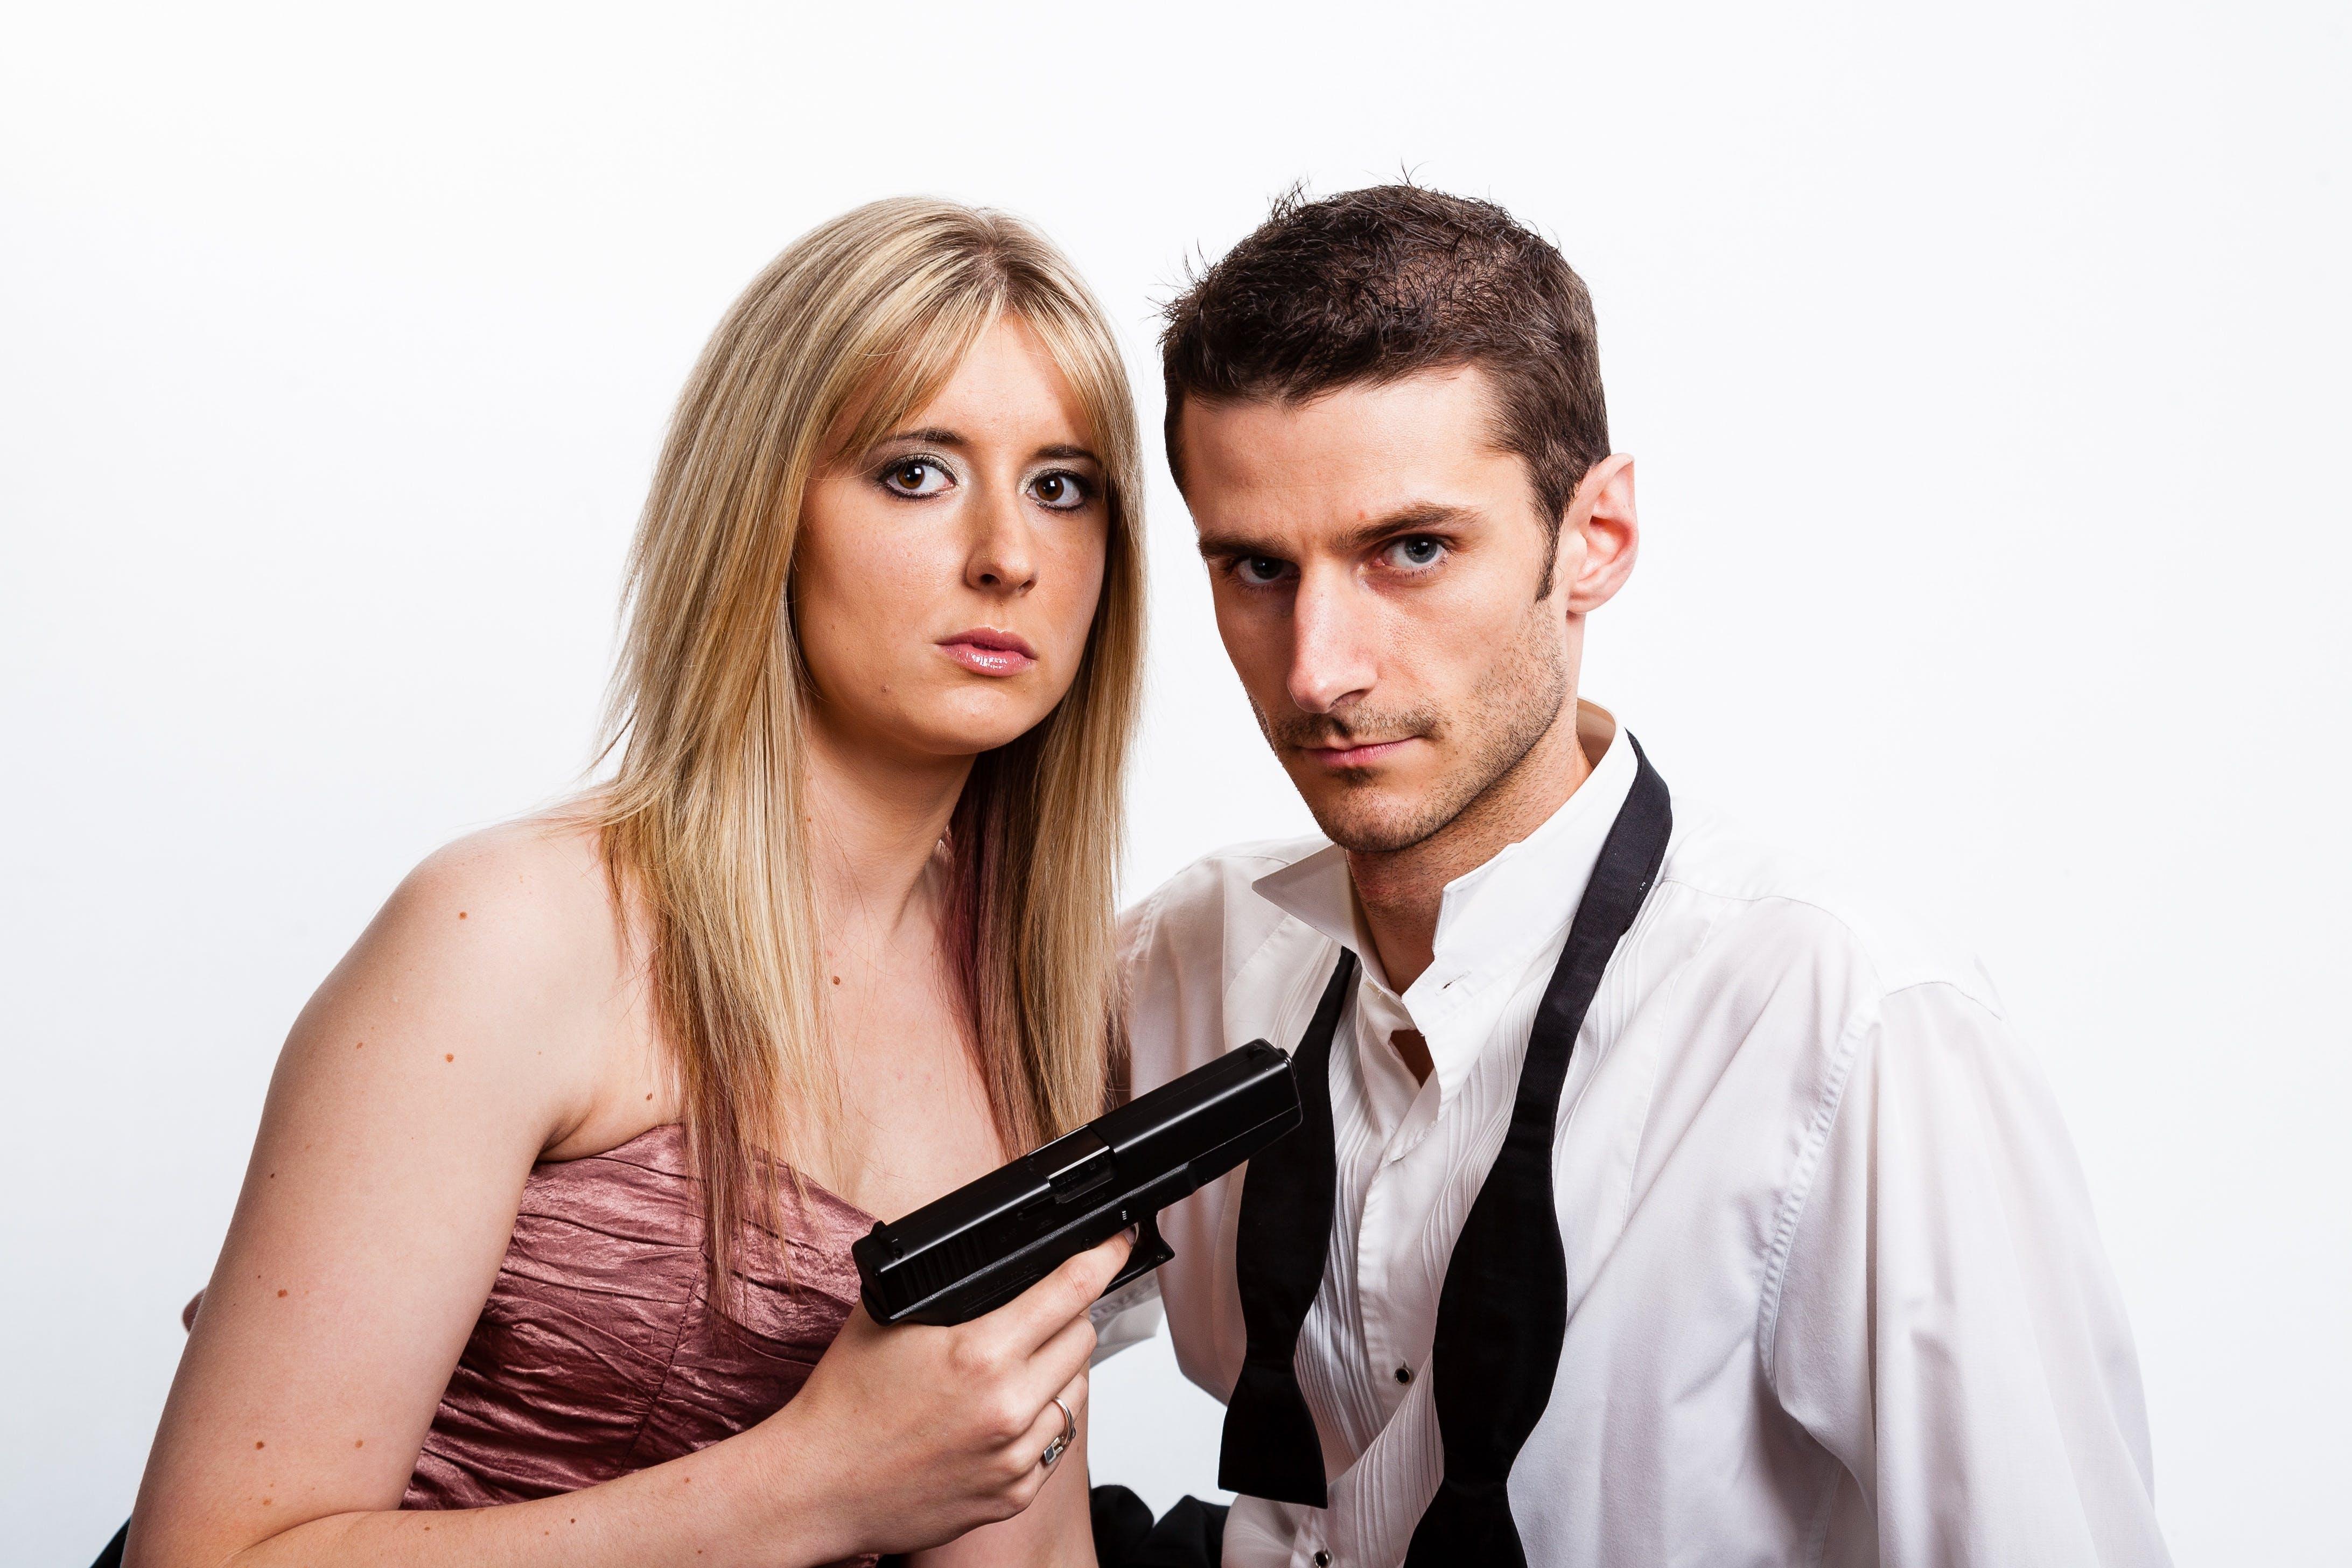 Woman Holding Pistol